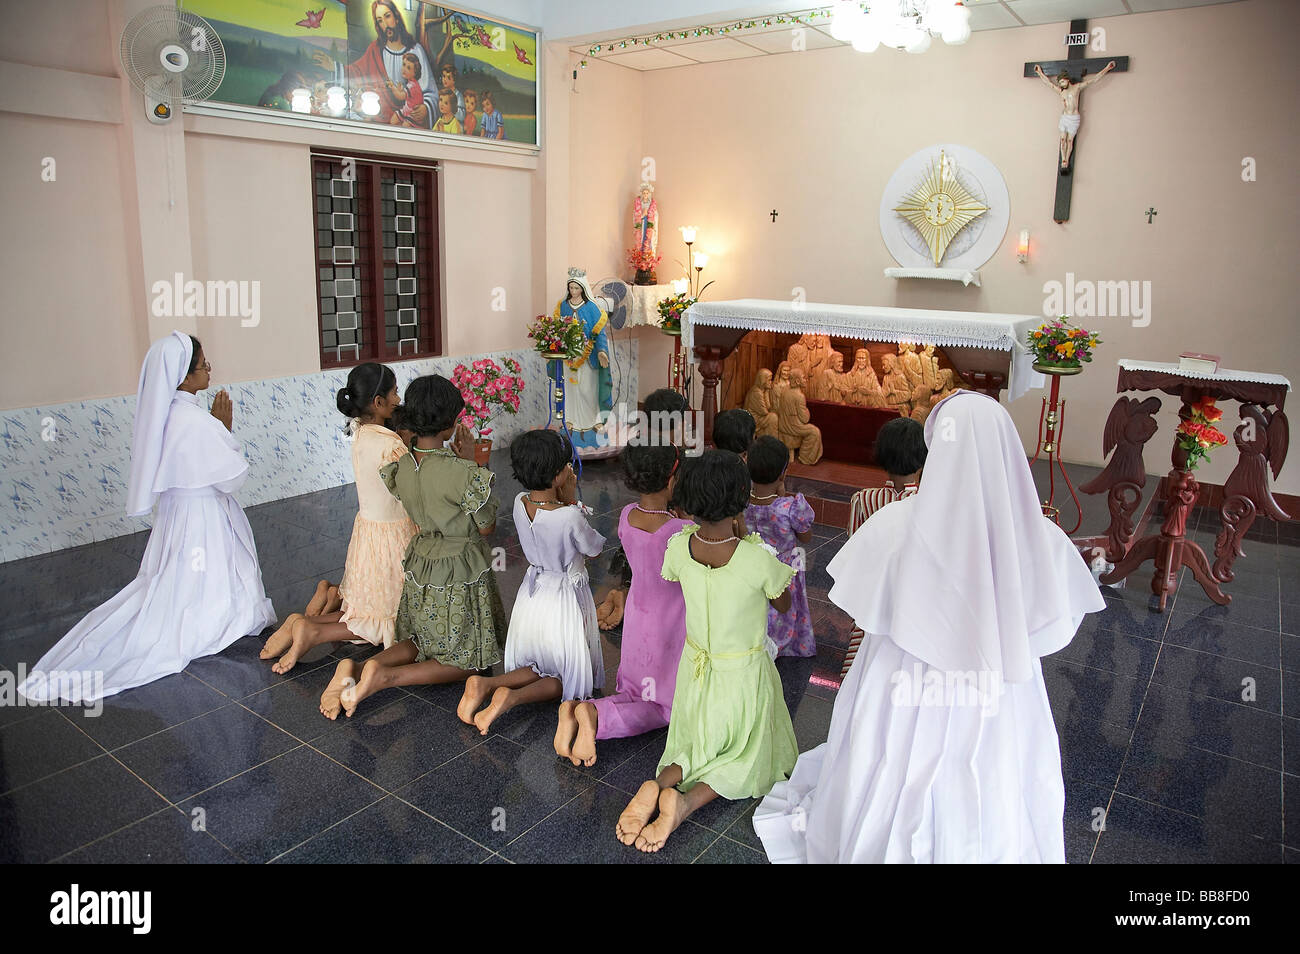 Painet jq3525 india nuns girls prayer mary matha bala bhavan Stock